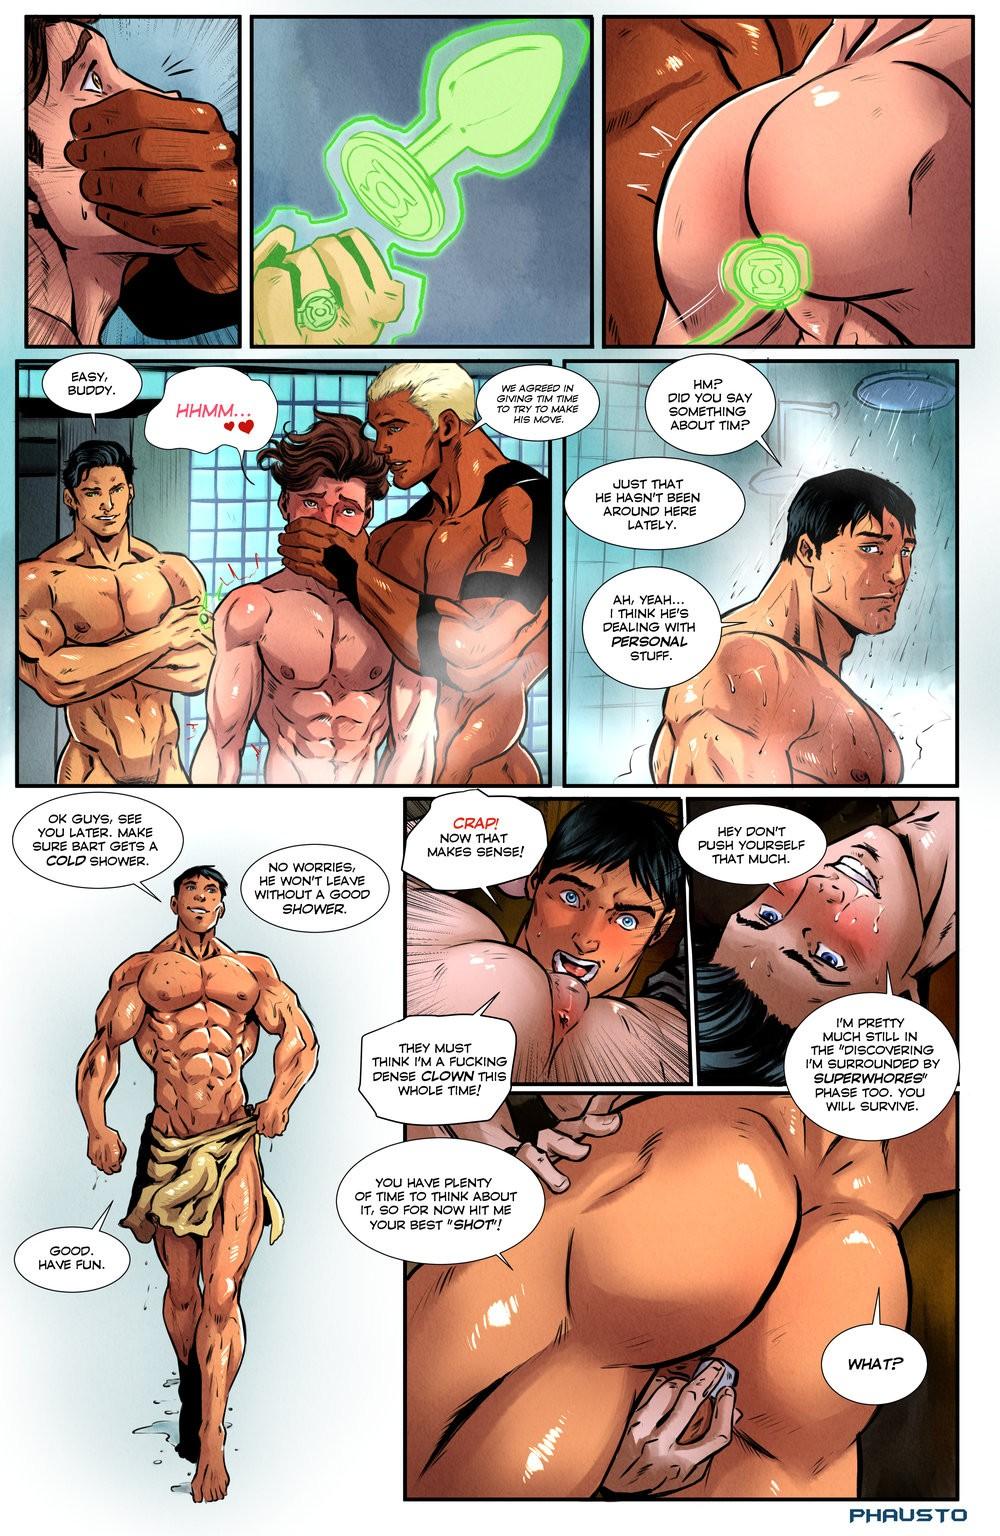 Comic porno gay Hottest HD